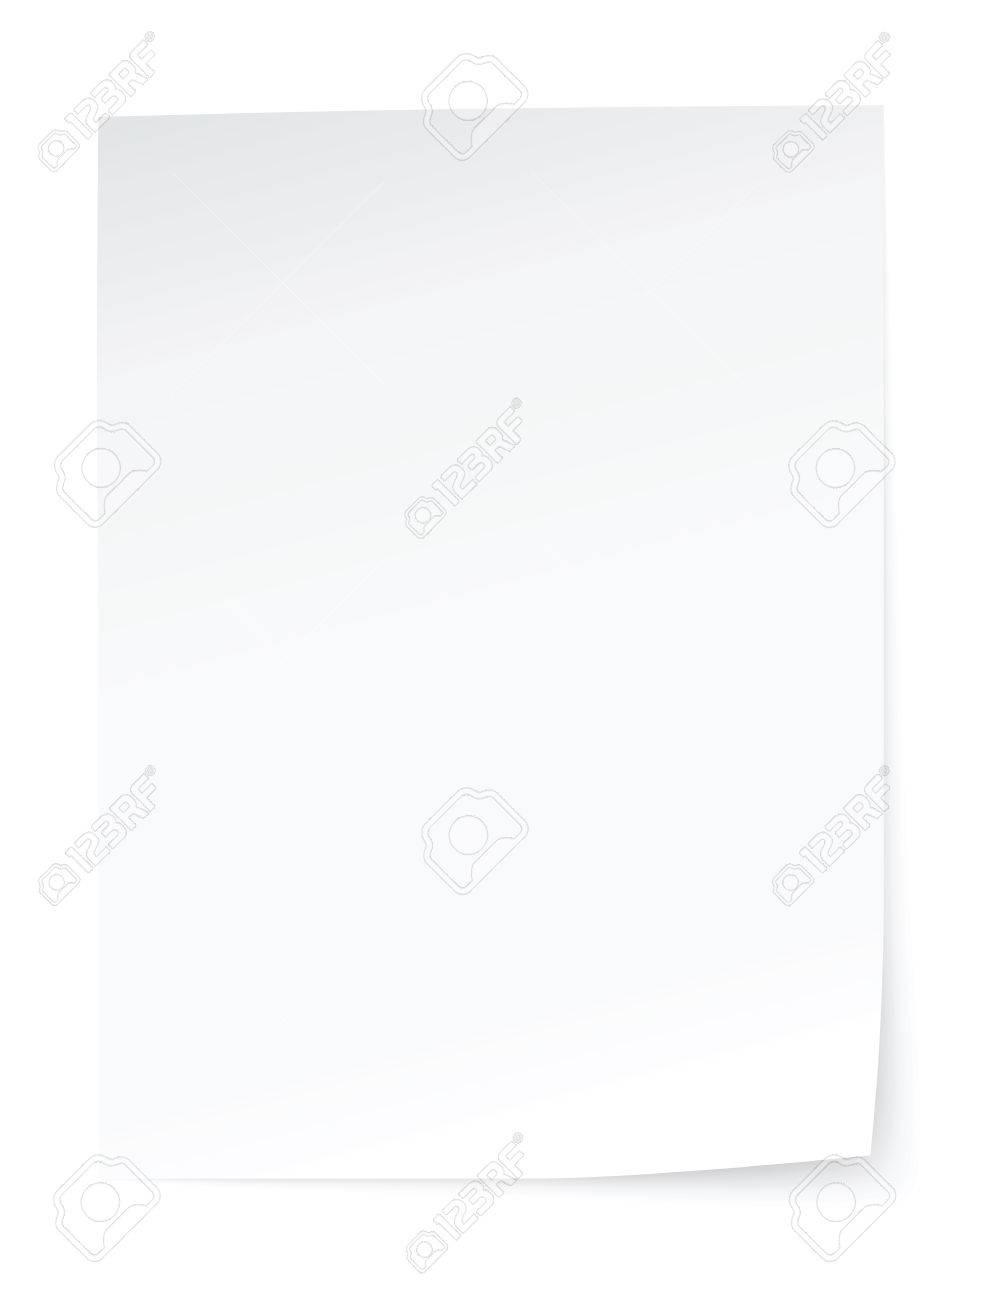 blank sheet of paper - 28961510